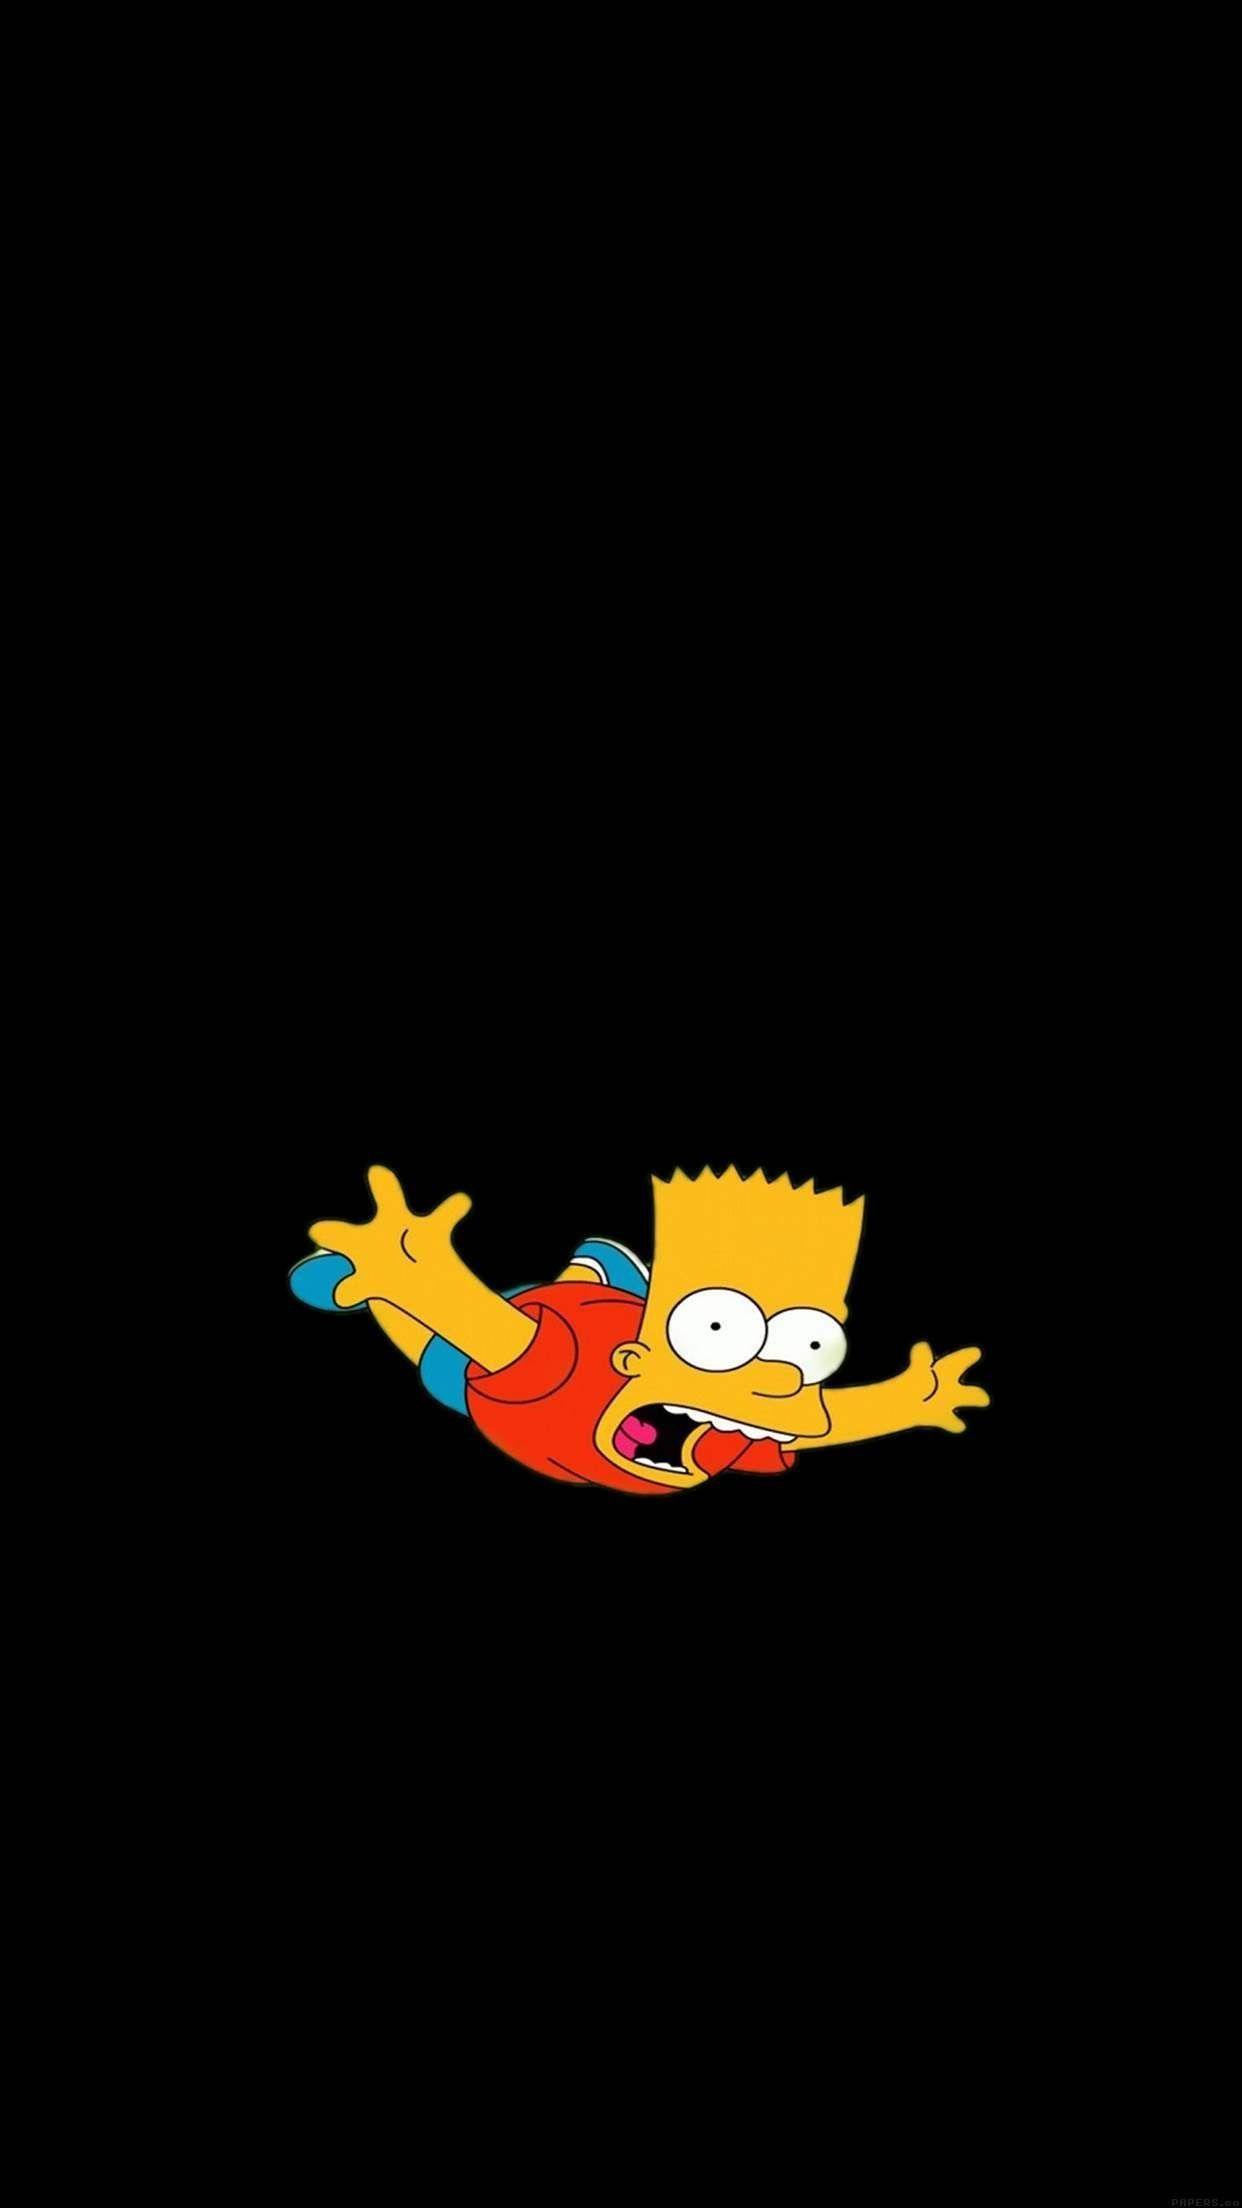 Bart Simpson Iphone Wallpapers Top Free Bart Simpson Within The Simpsons Wallpaper Iphone 6 In 2020 Simpson Wallpaper Iphone Iphone Wallpaper Hipster Cartoon Wallpaper